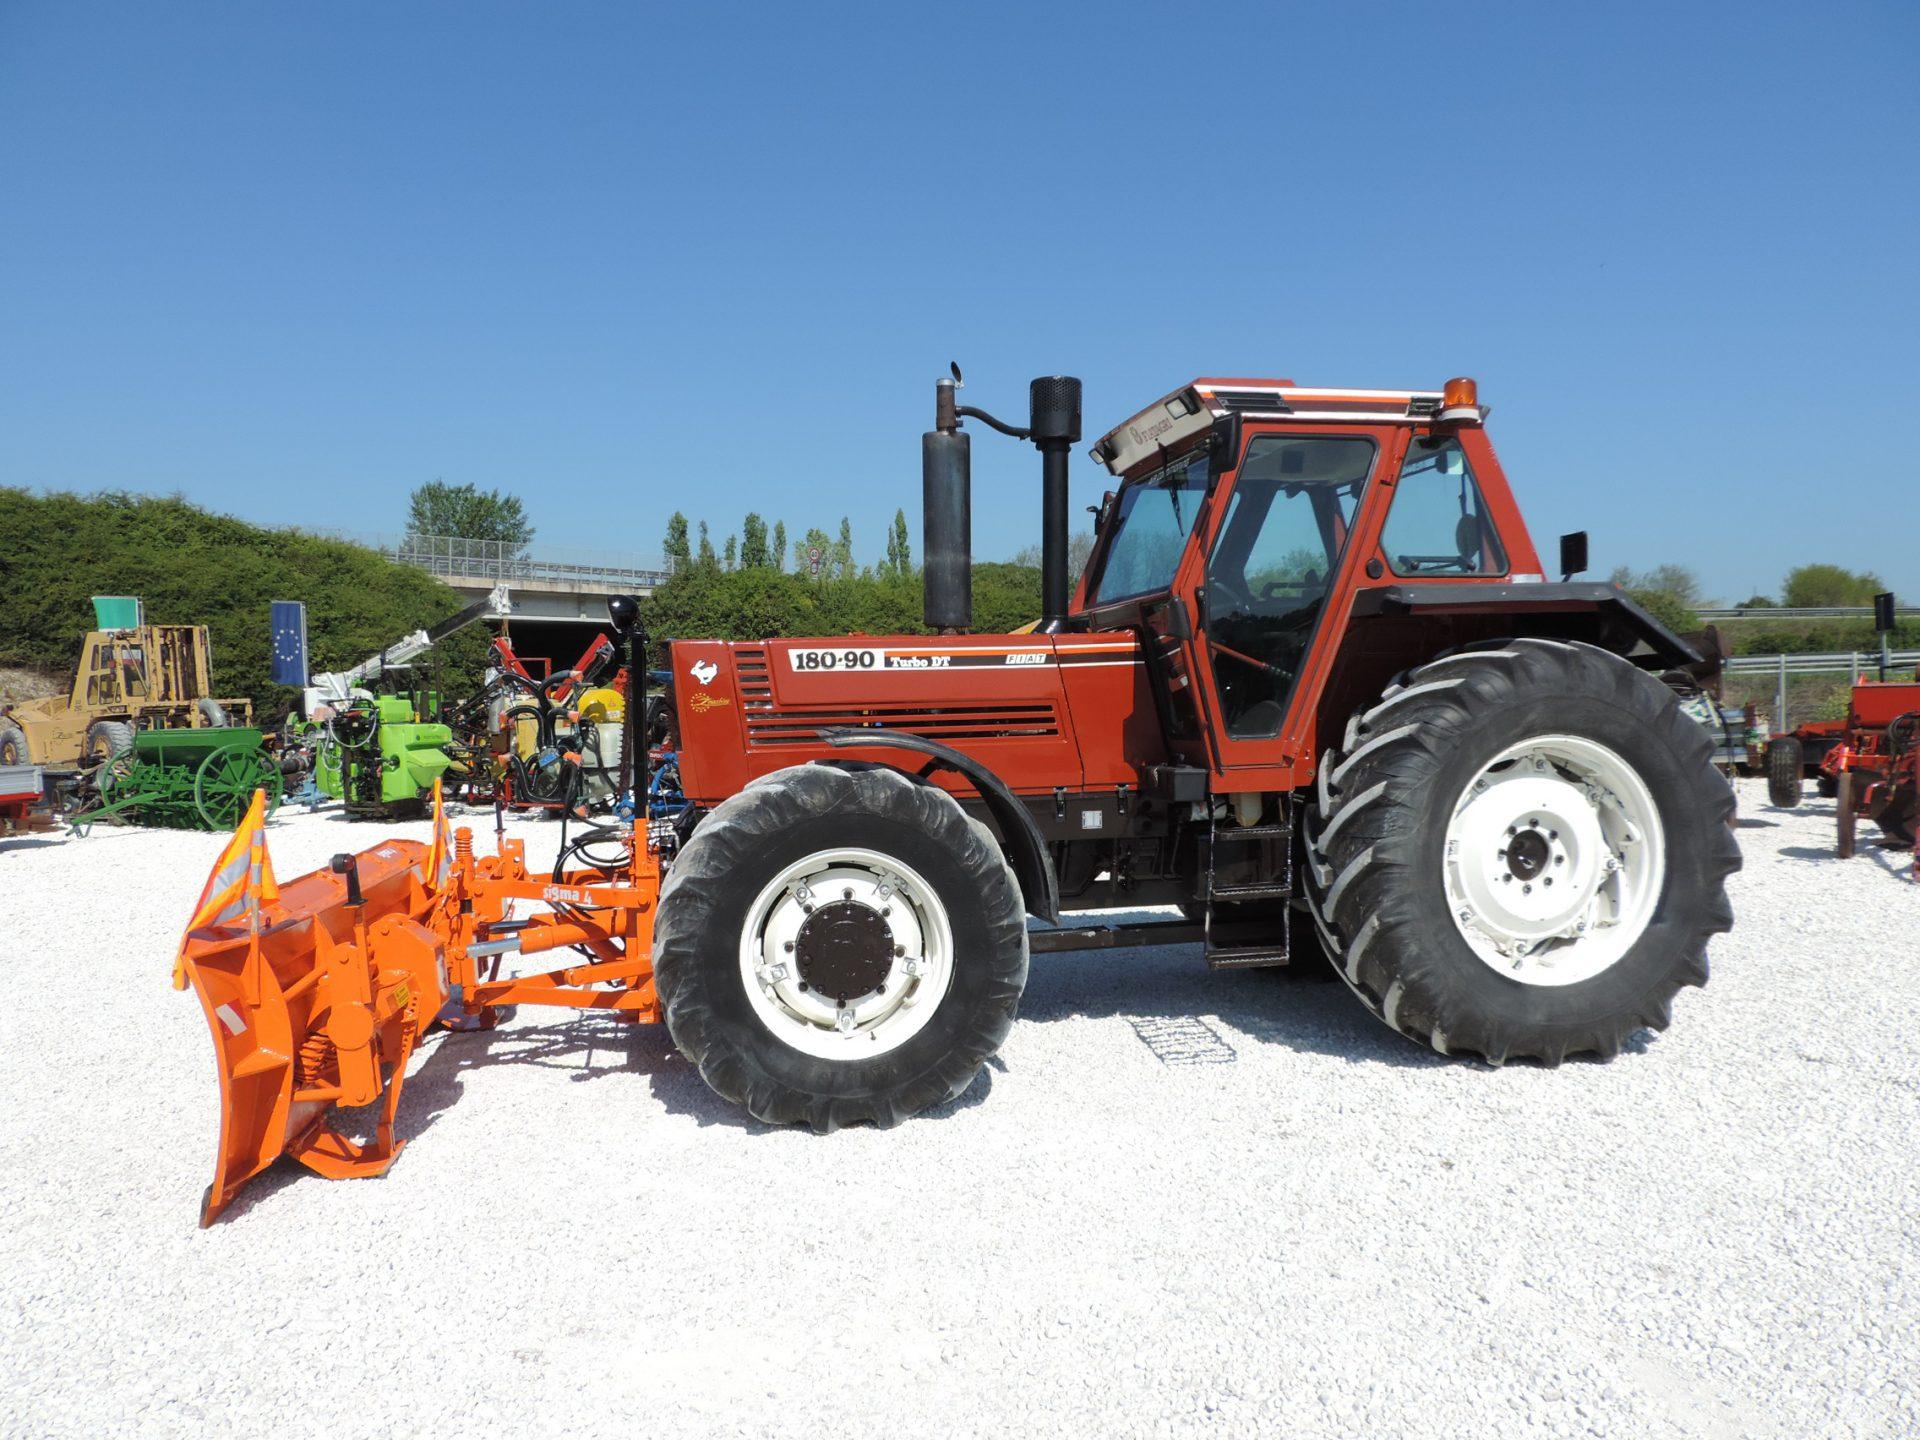 tractors on tyres fiat 180 90 dt one ex owner zeta macchine. Black Bedroom Furniture Sets. Home Design Ideas